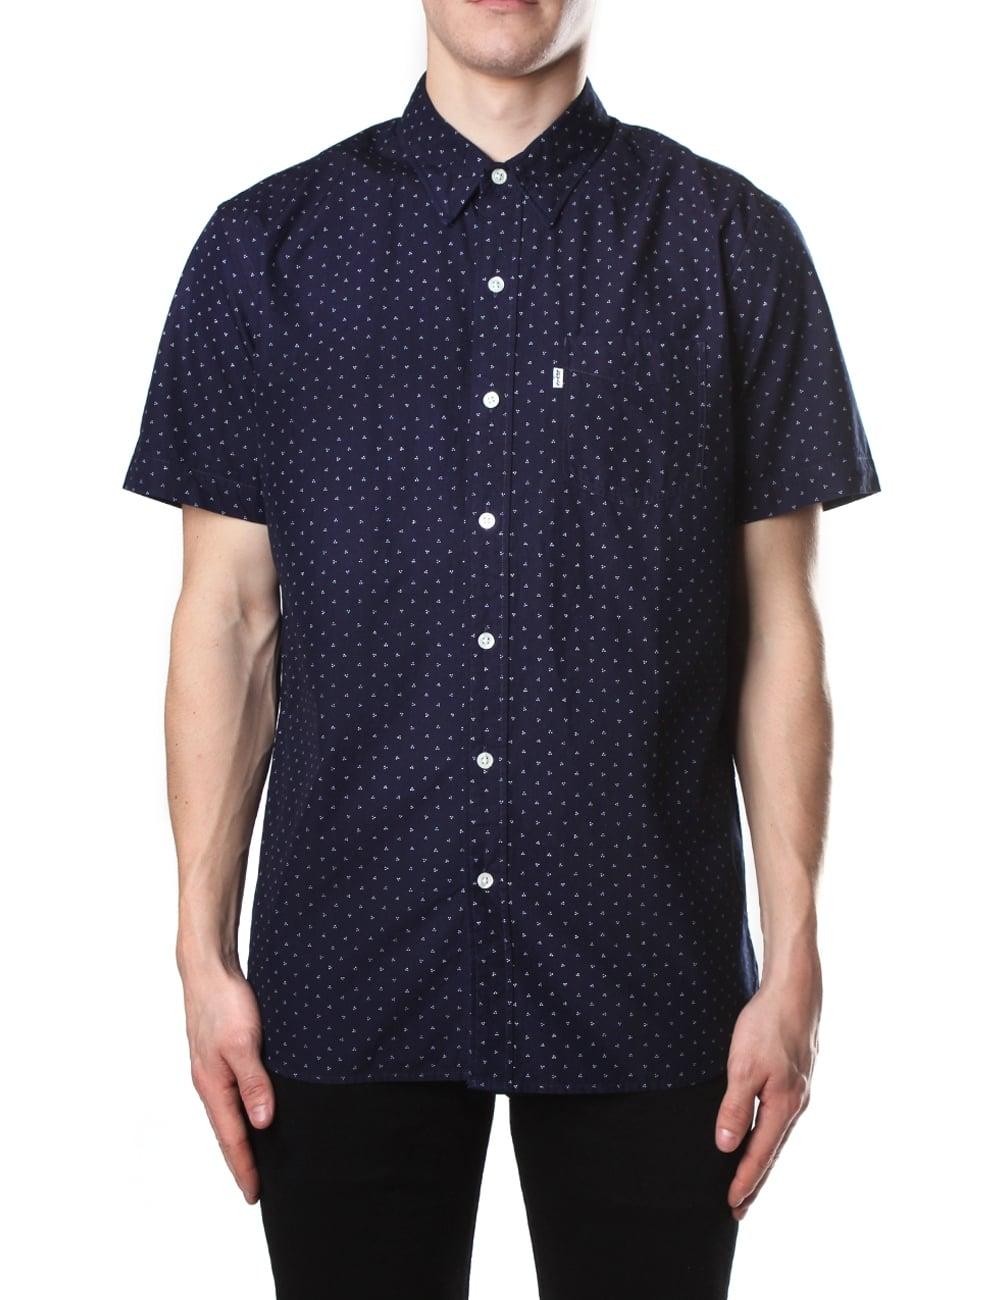 Levis Sunset Shirt The T One Pocket True Blue 65824 0337 Levi S Short Sleeve Men